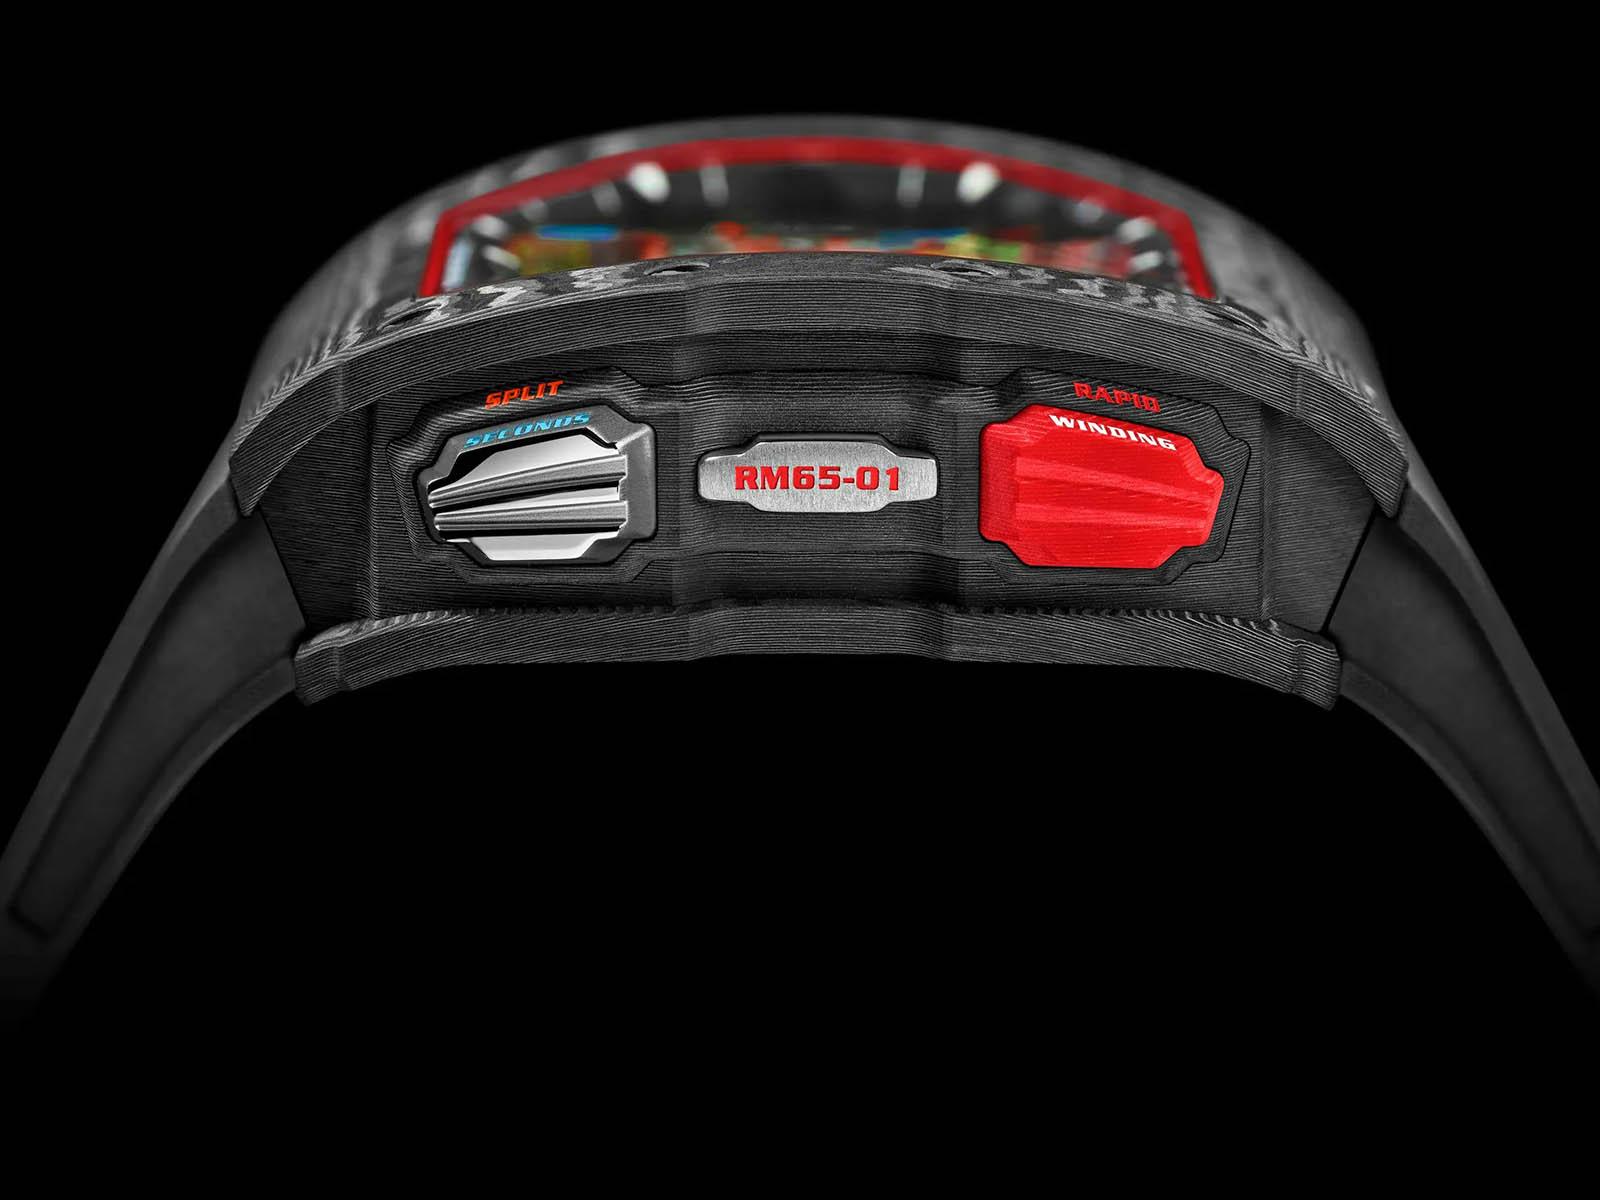 richard-mille-rm-65-01-automatic-split-seconds-chronograph-6.jpg